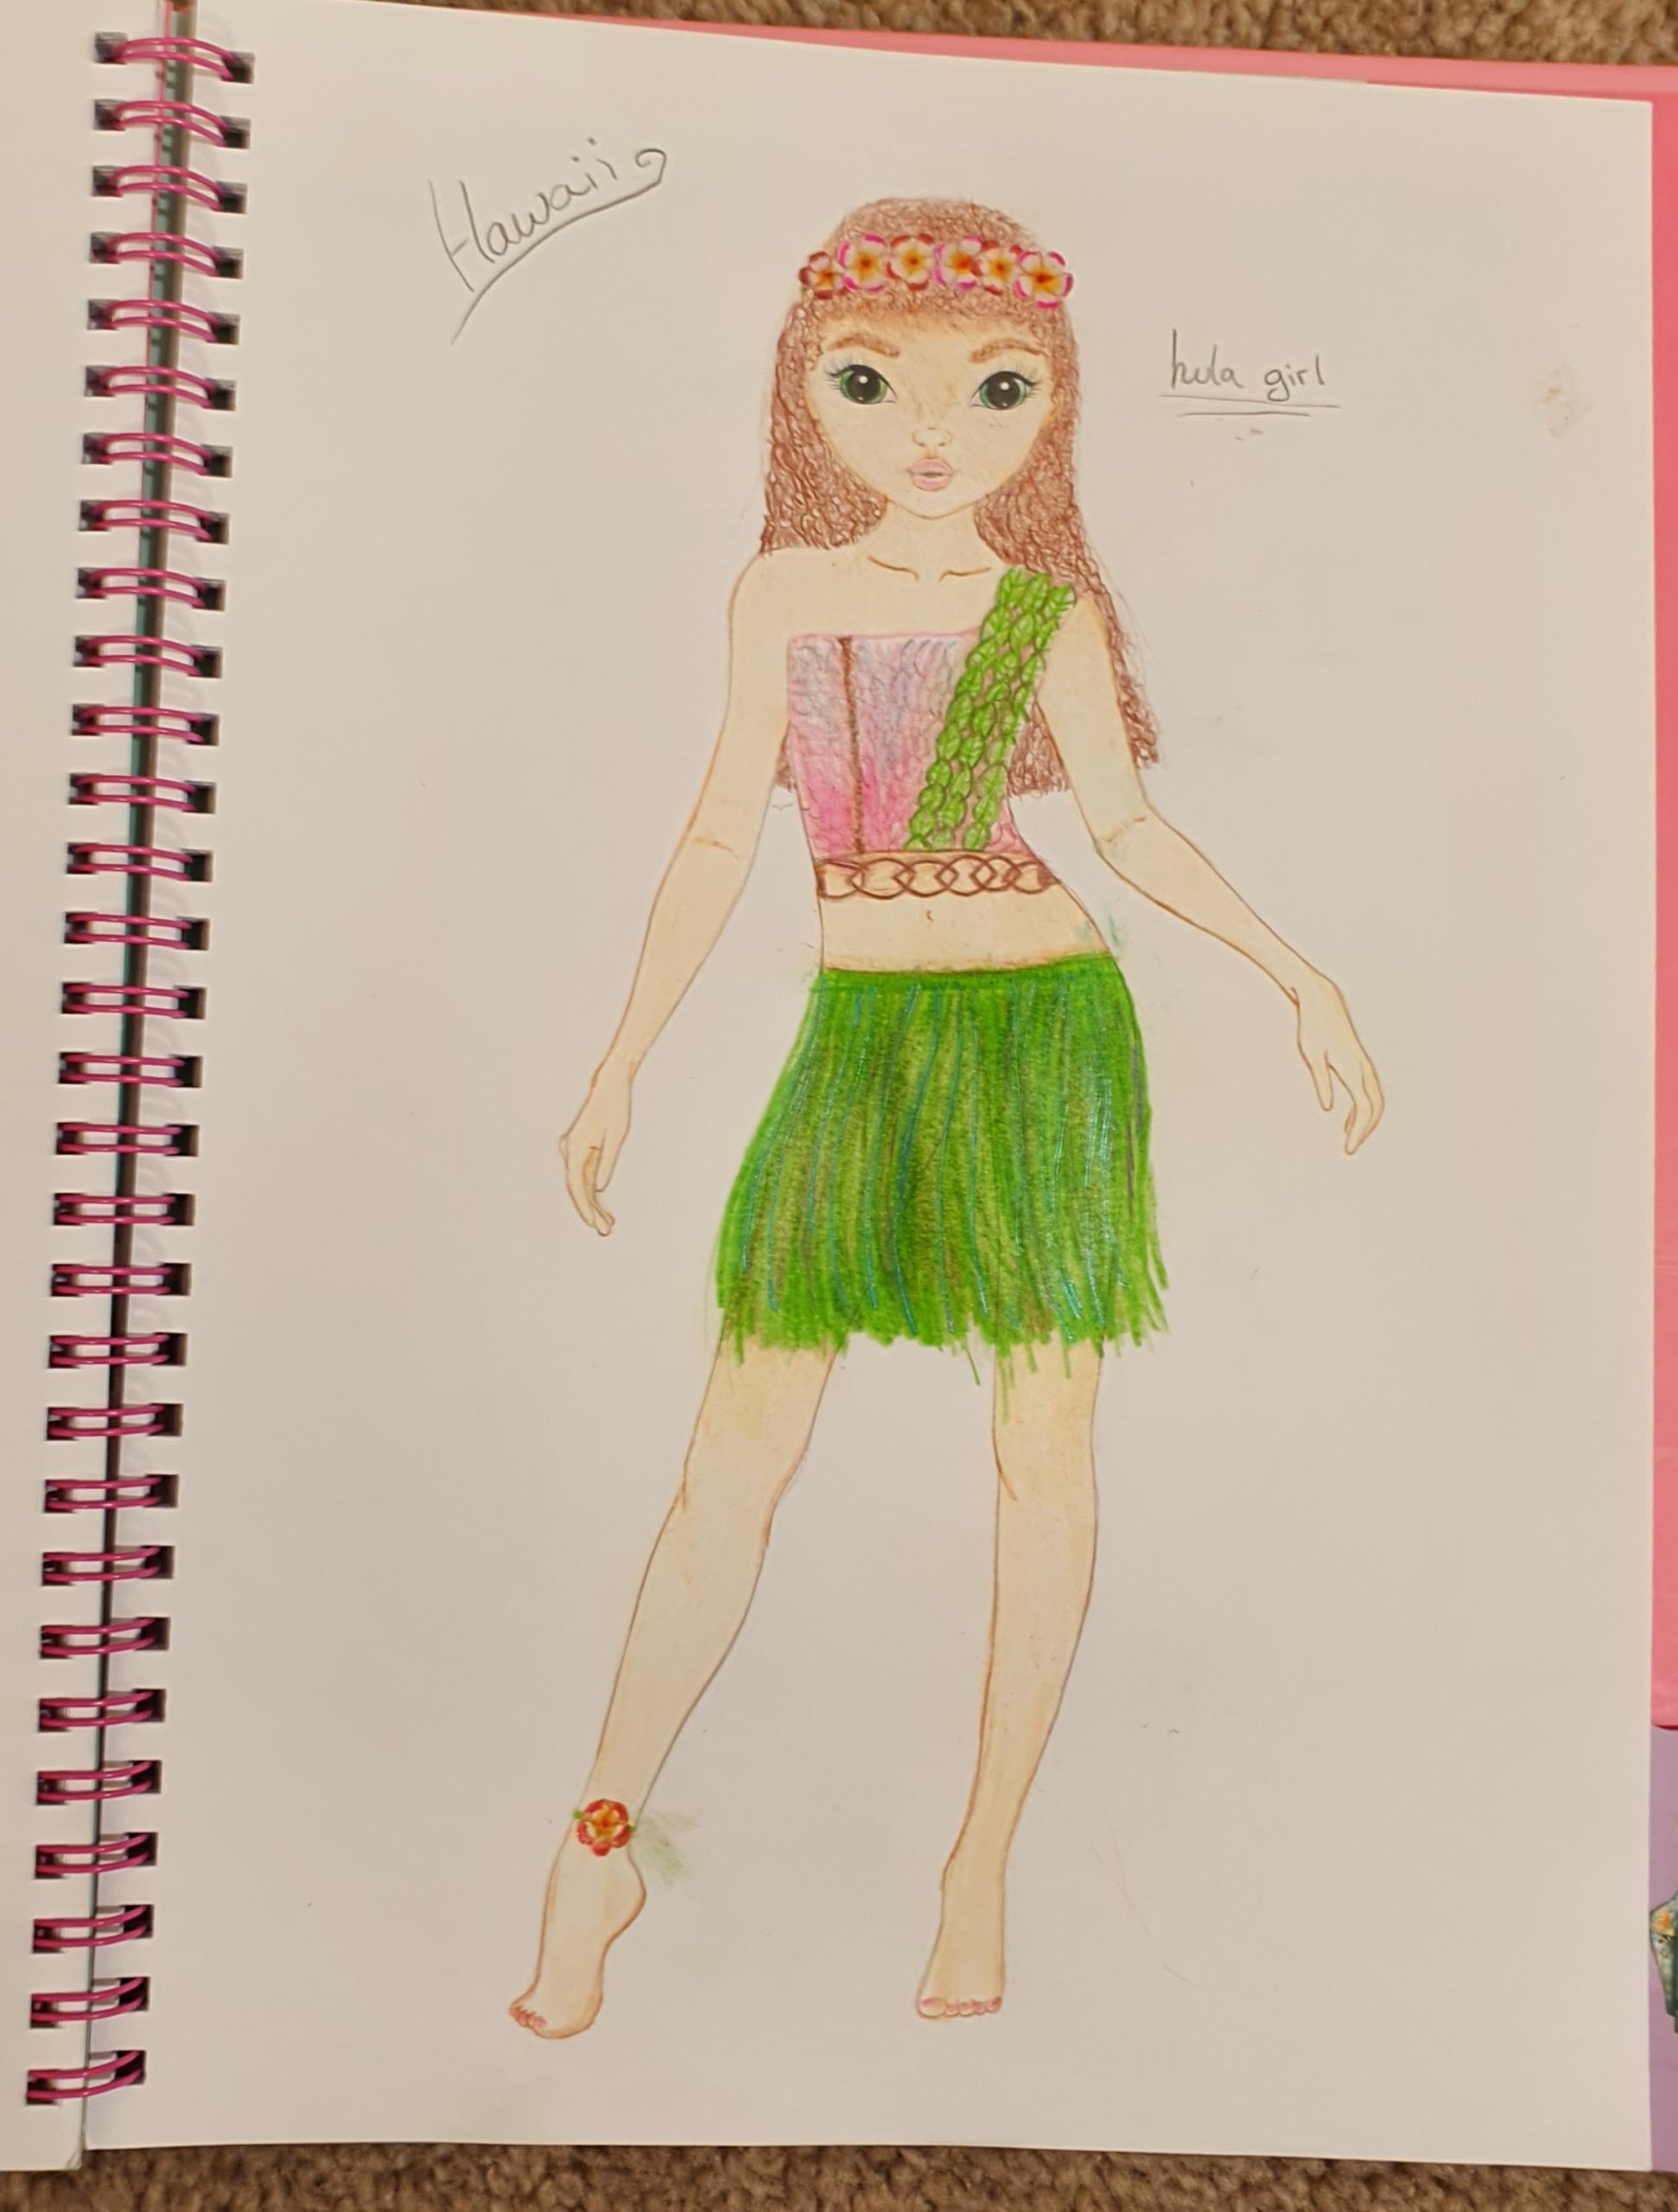 Sylvie M., 13 Jahre, aus Tasmania